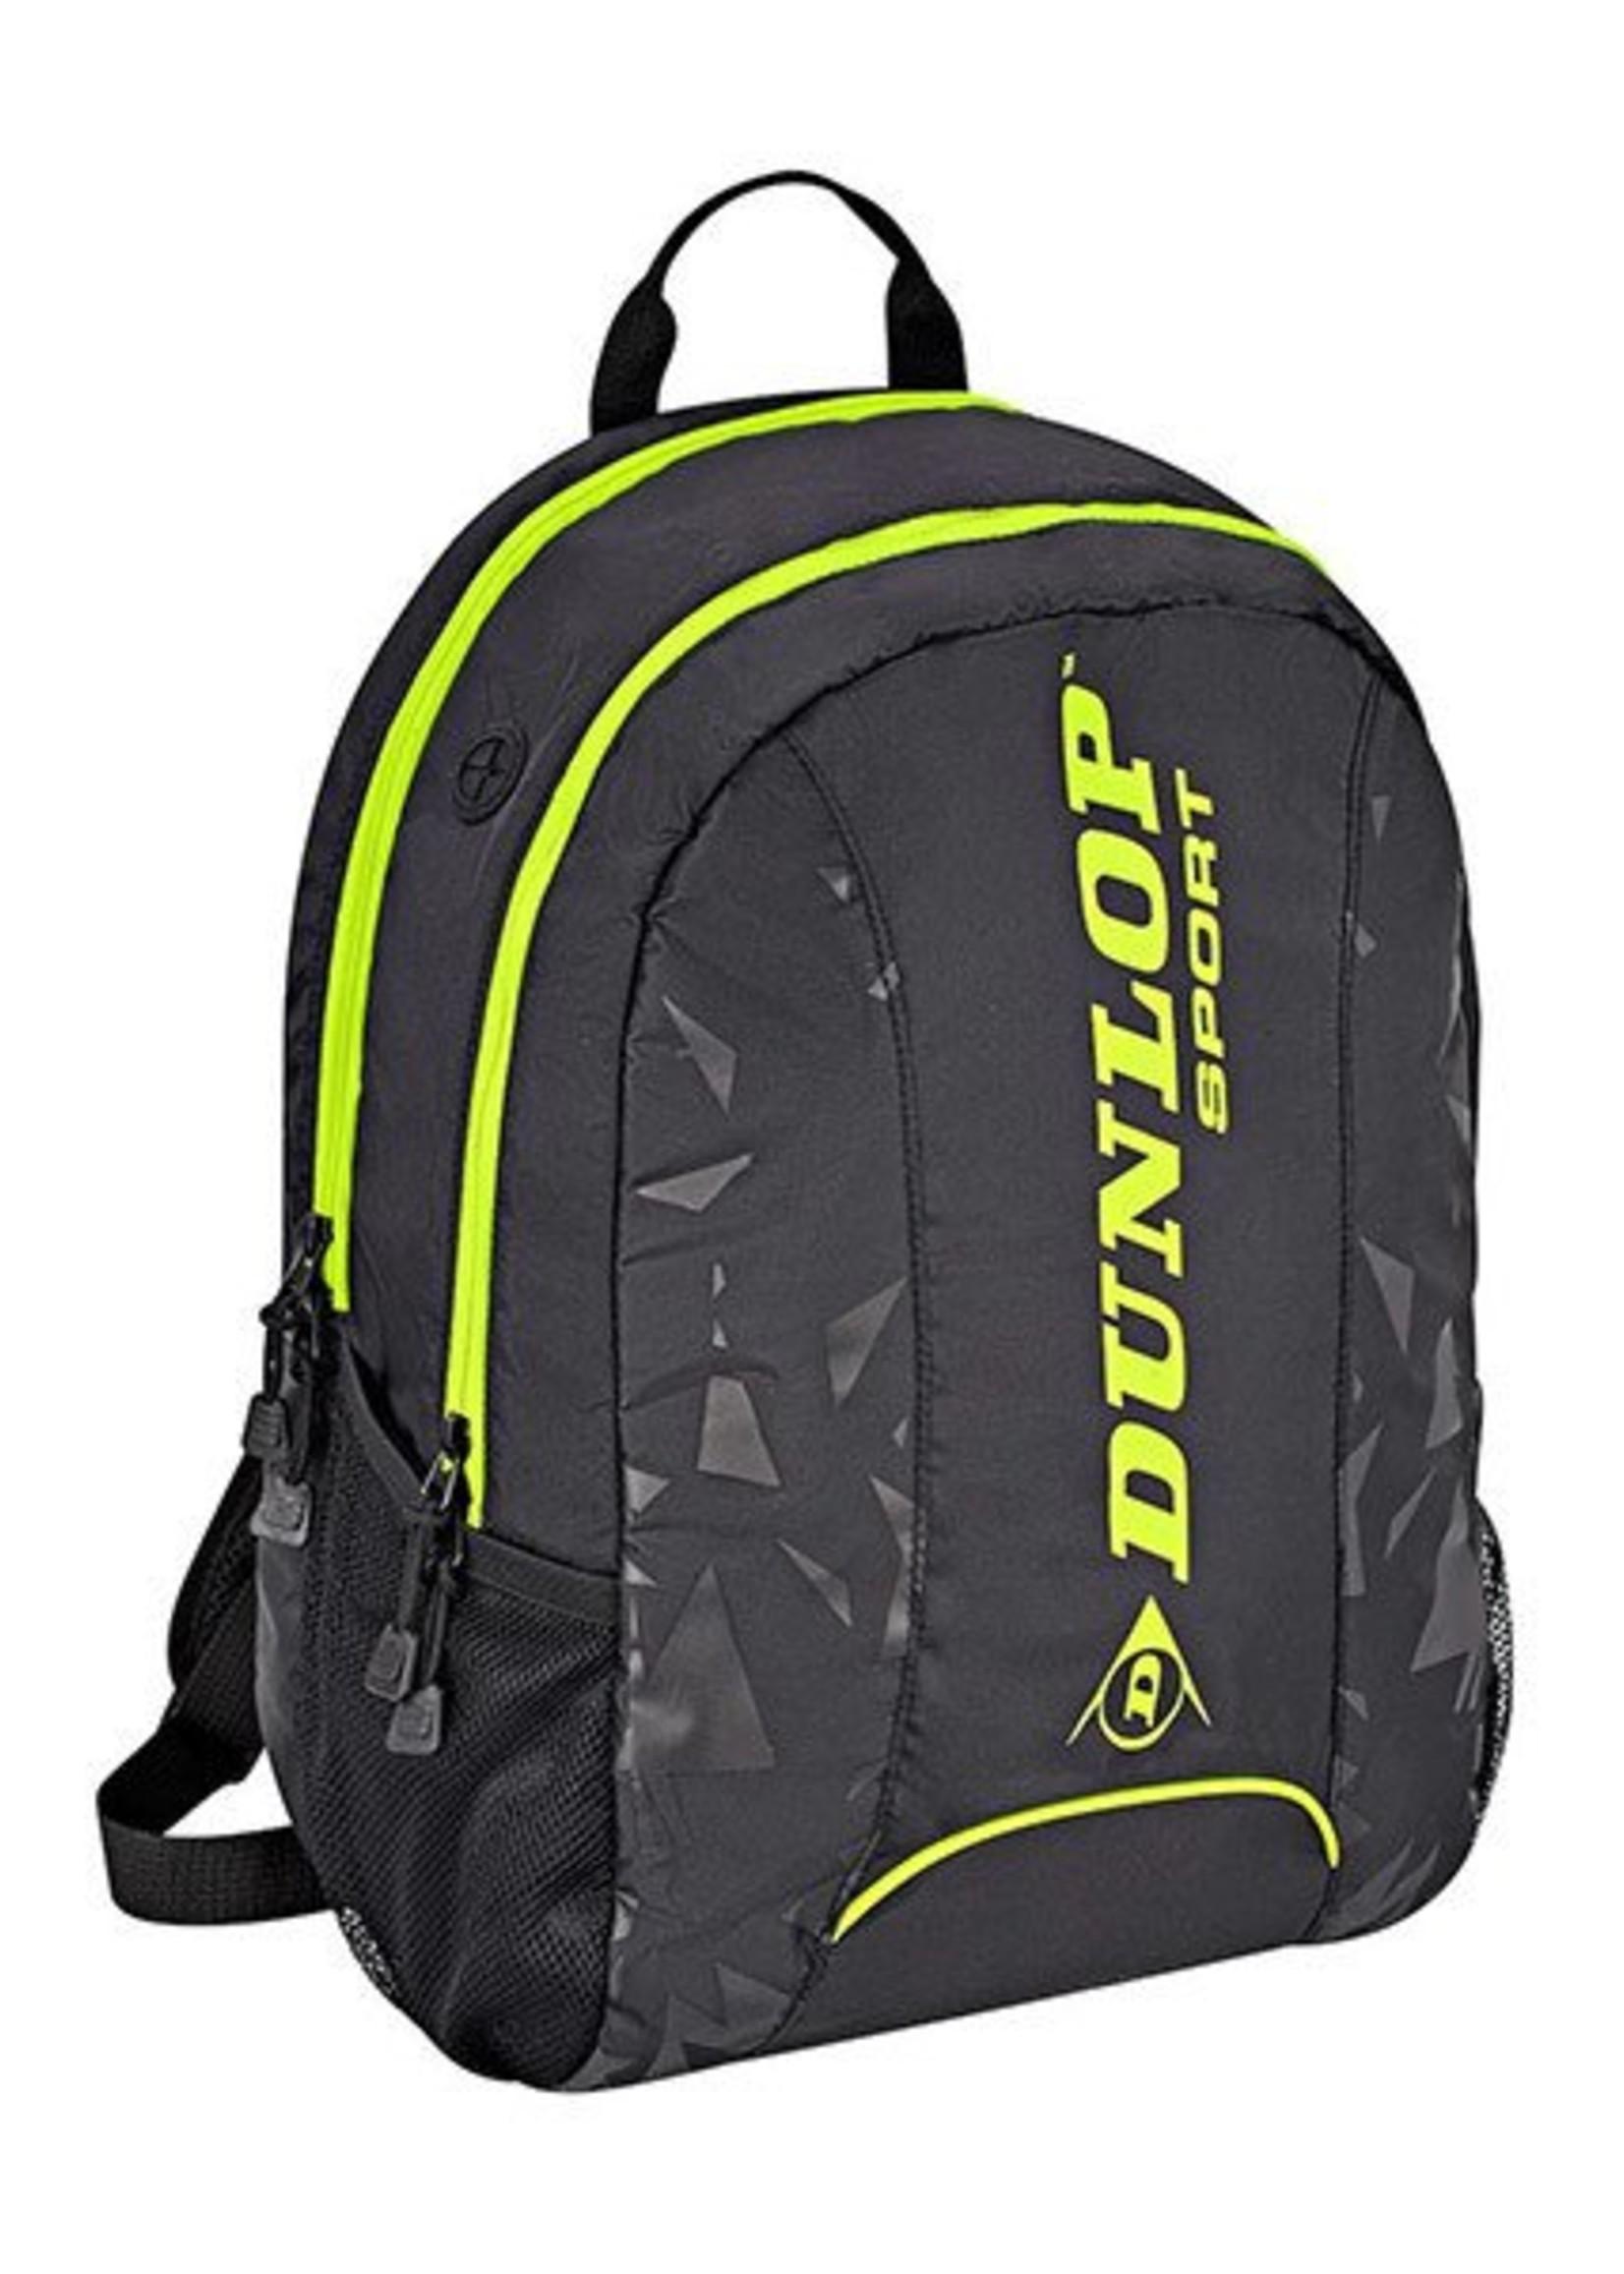 Dunlop Dunlop Revolution NT Backpack (Black/Yellow)